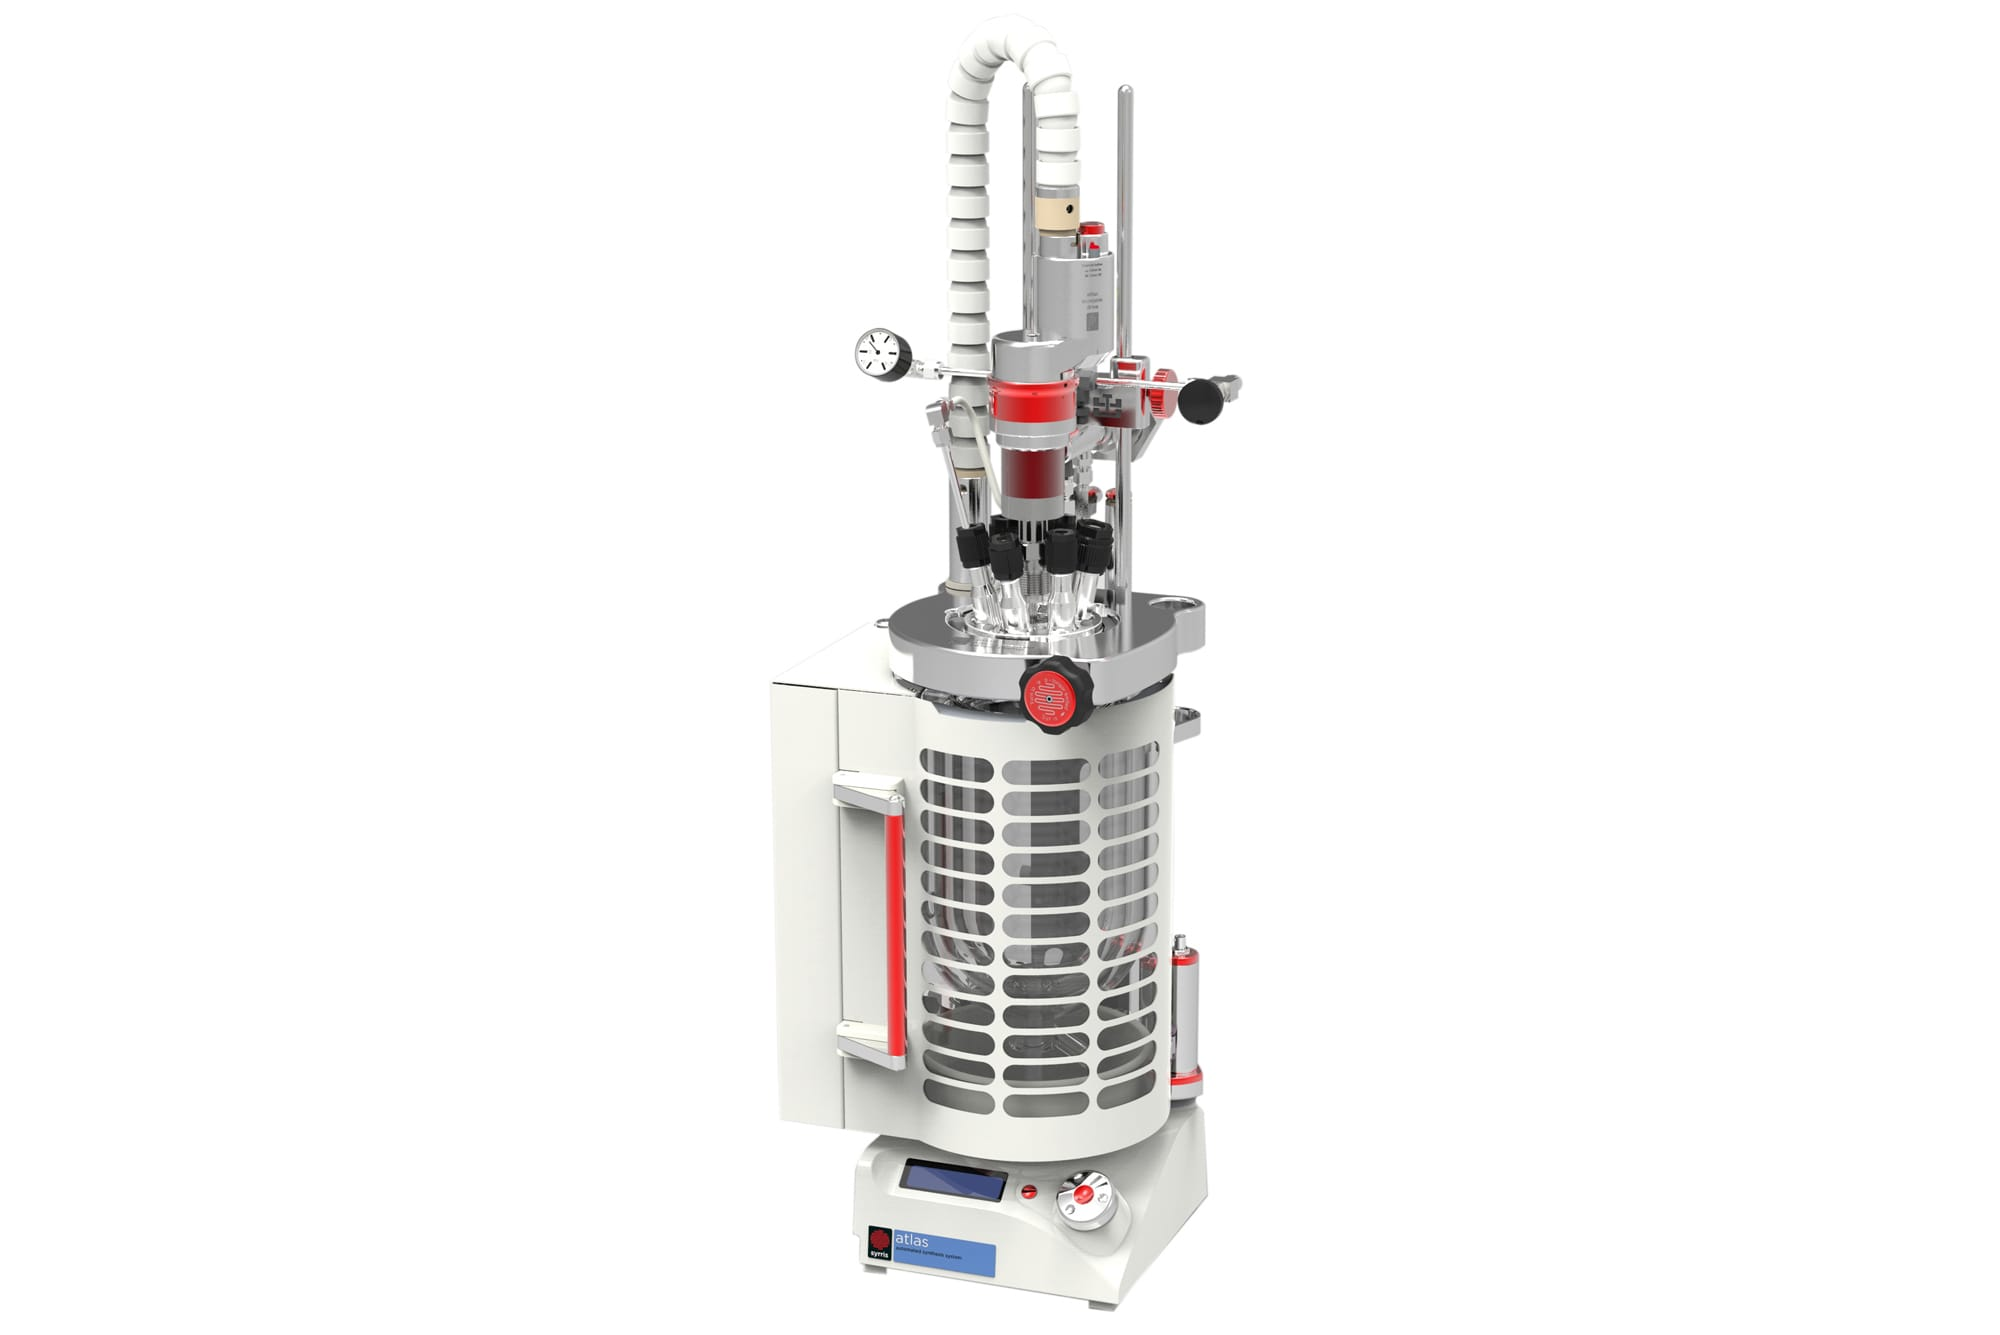 syrris u2019 versatile atlas batch reactor system makes